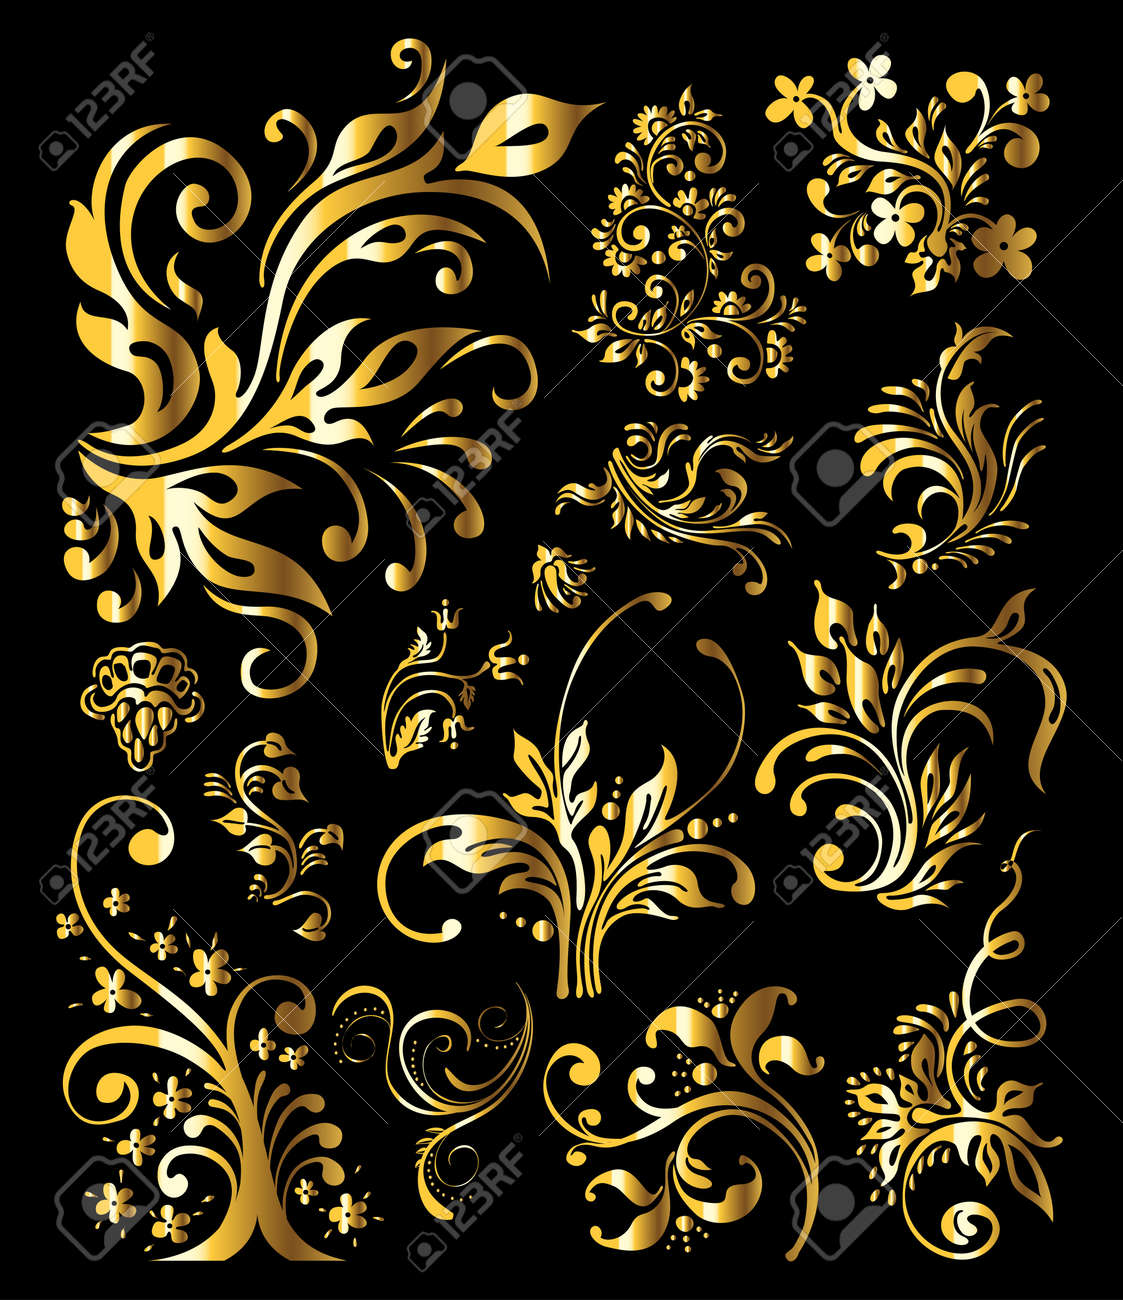 Floral Ornament Set of Vintage Golden Decoration Elements Stock Vector - 12195902